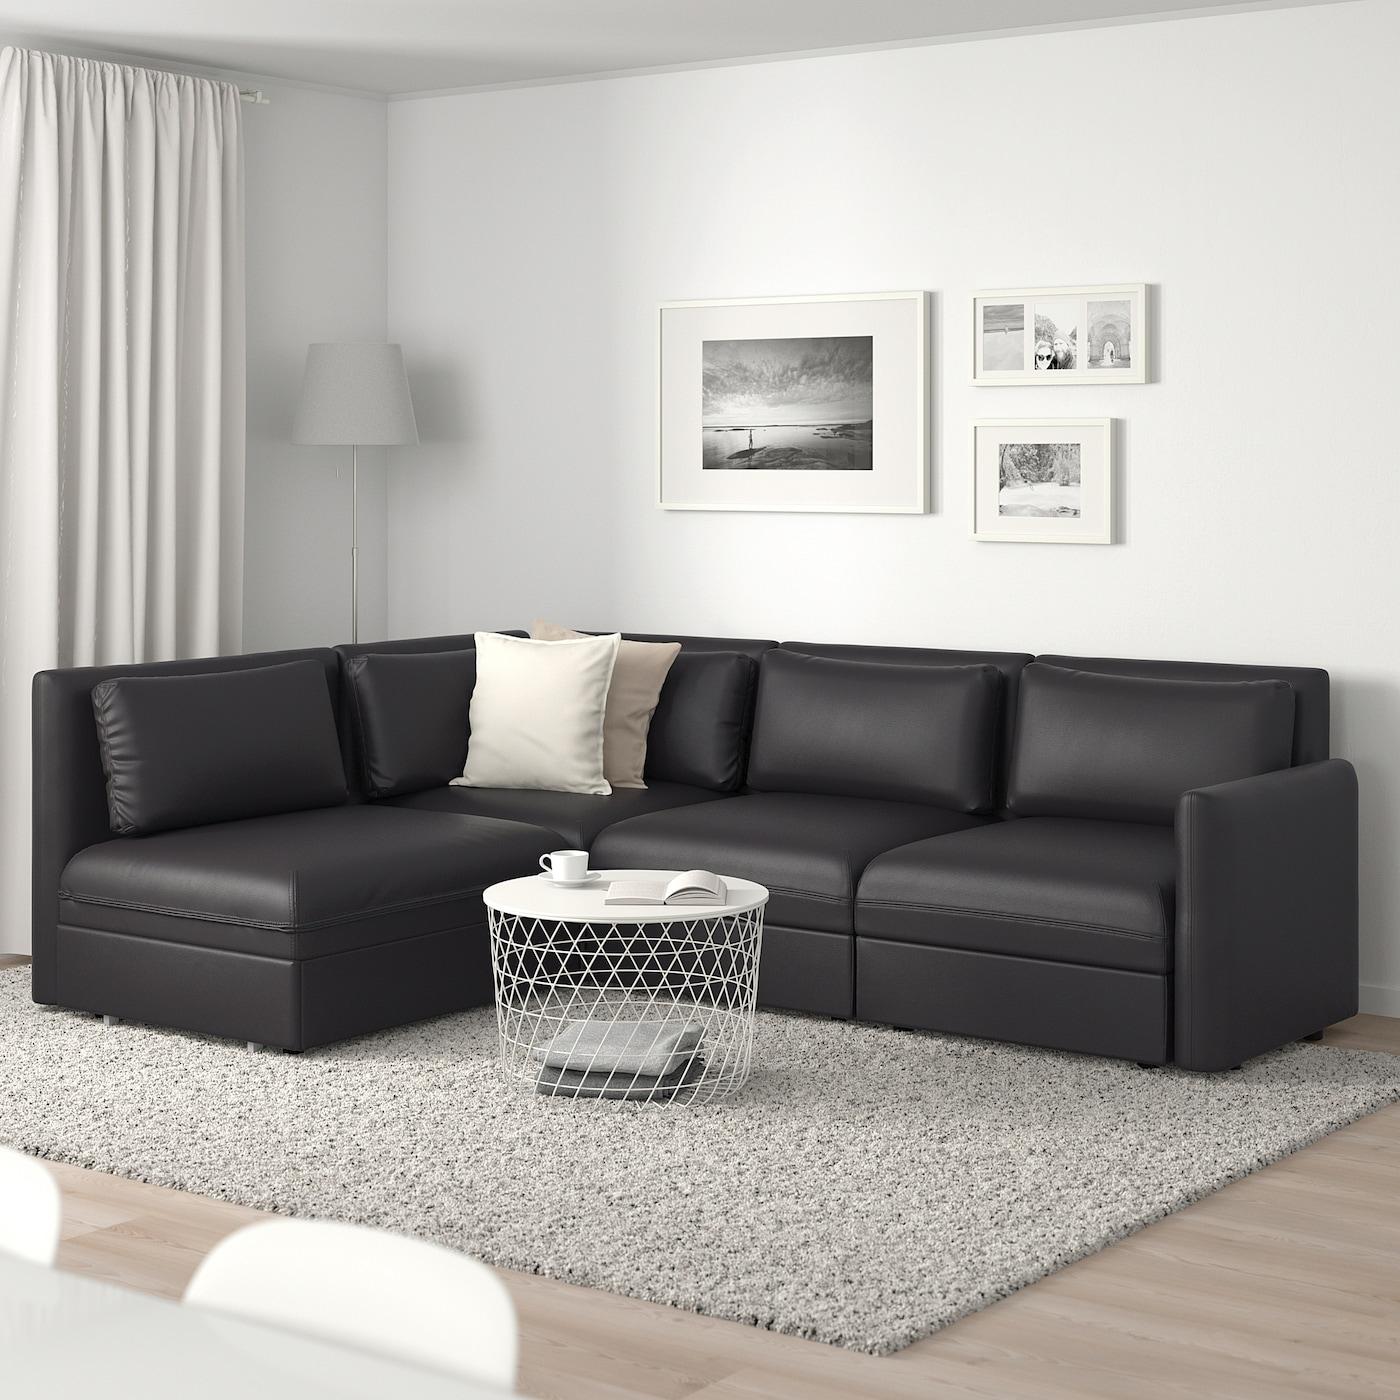 Picture of: Vallentuna Modular Corner Sofa 3 Seat Sofa Bed And Storage Murum Black Ikea